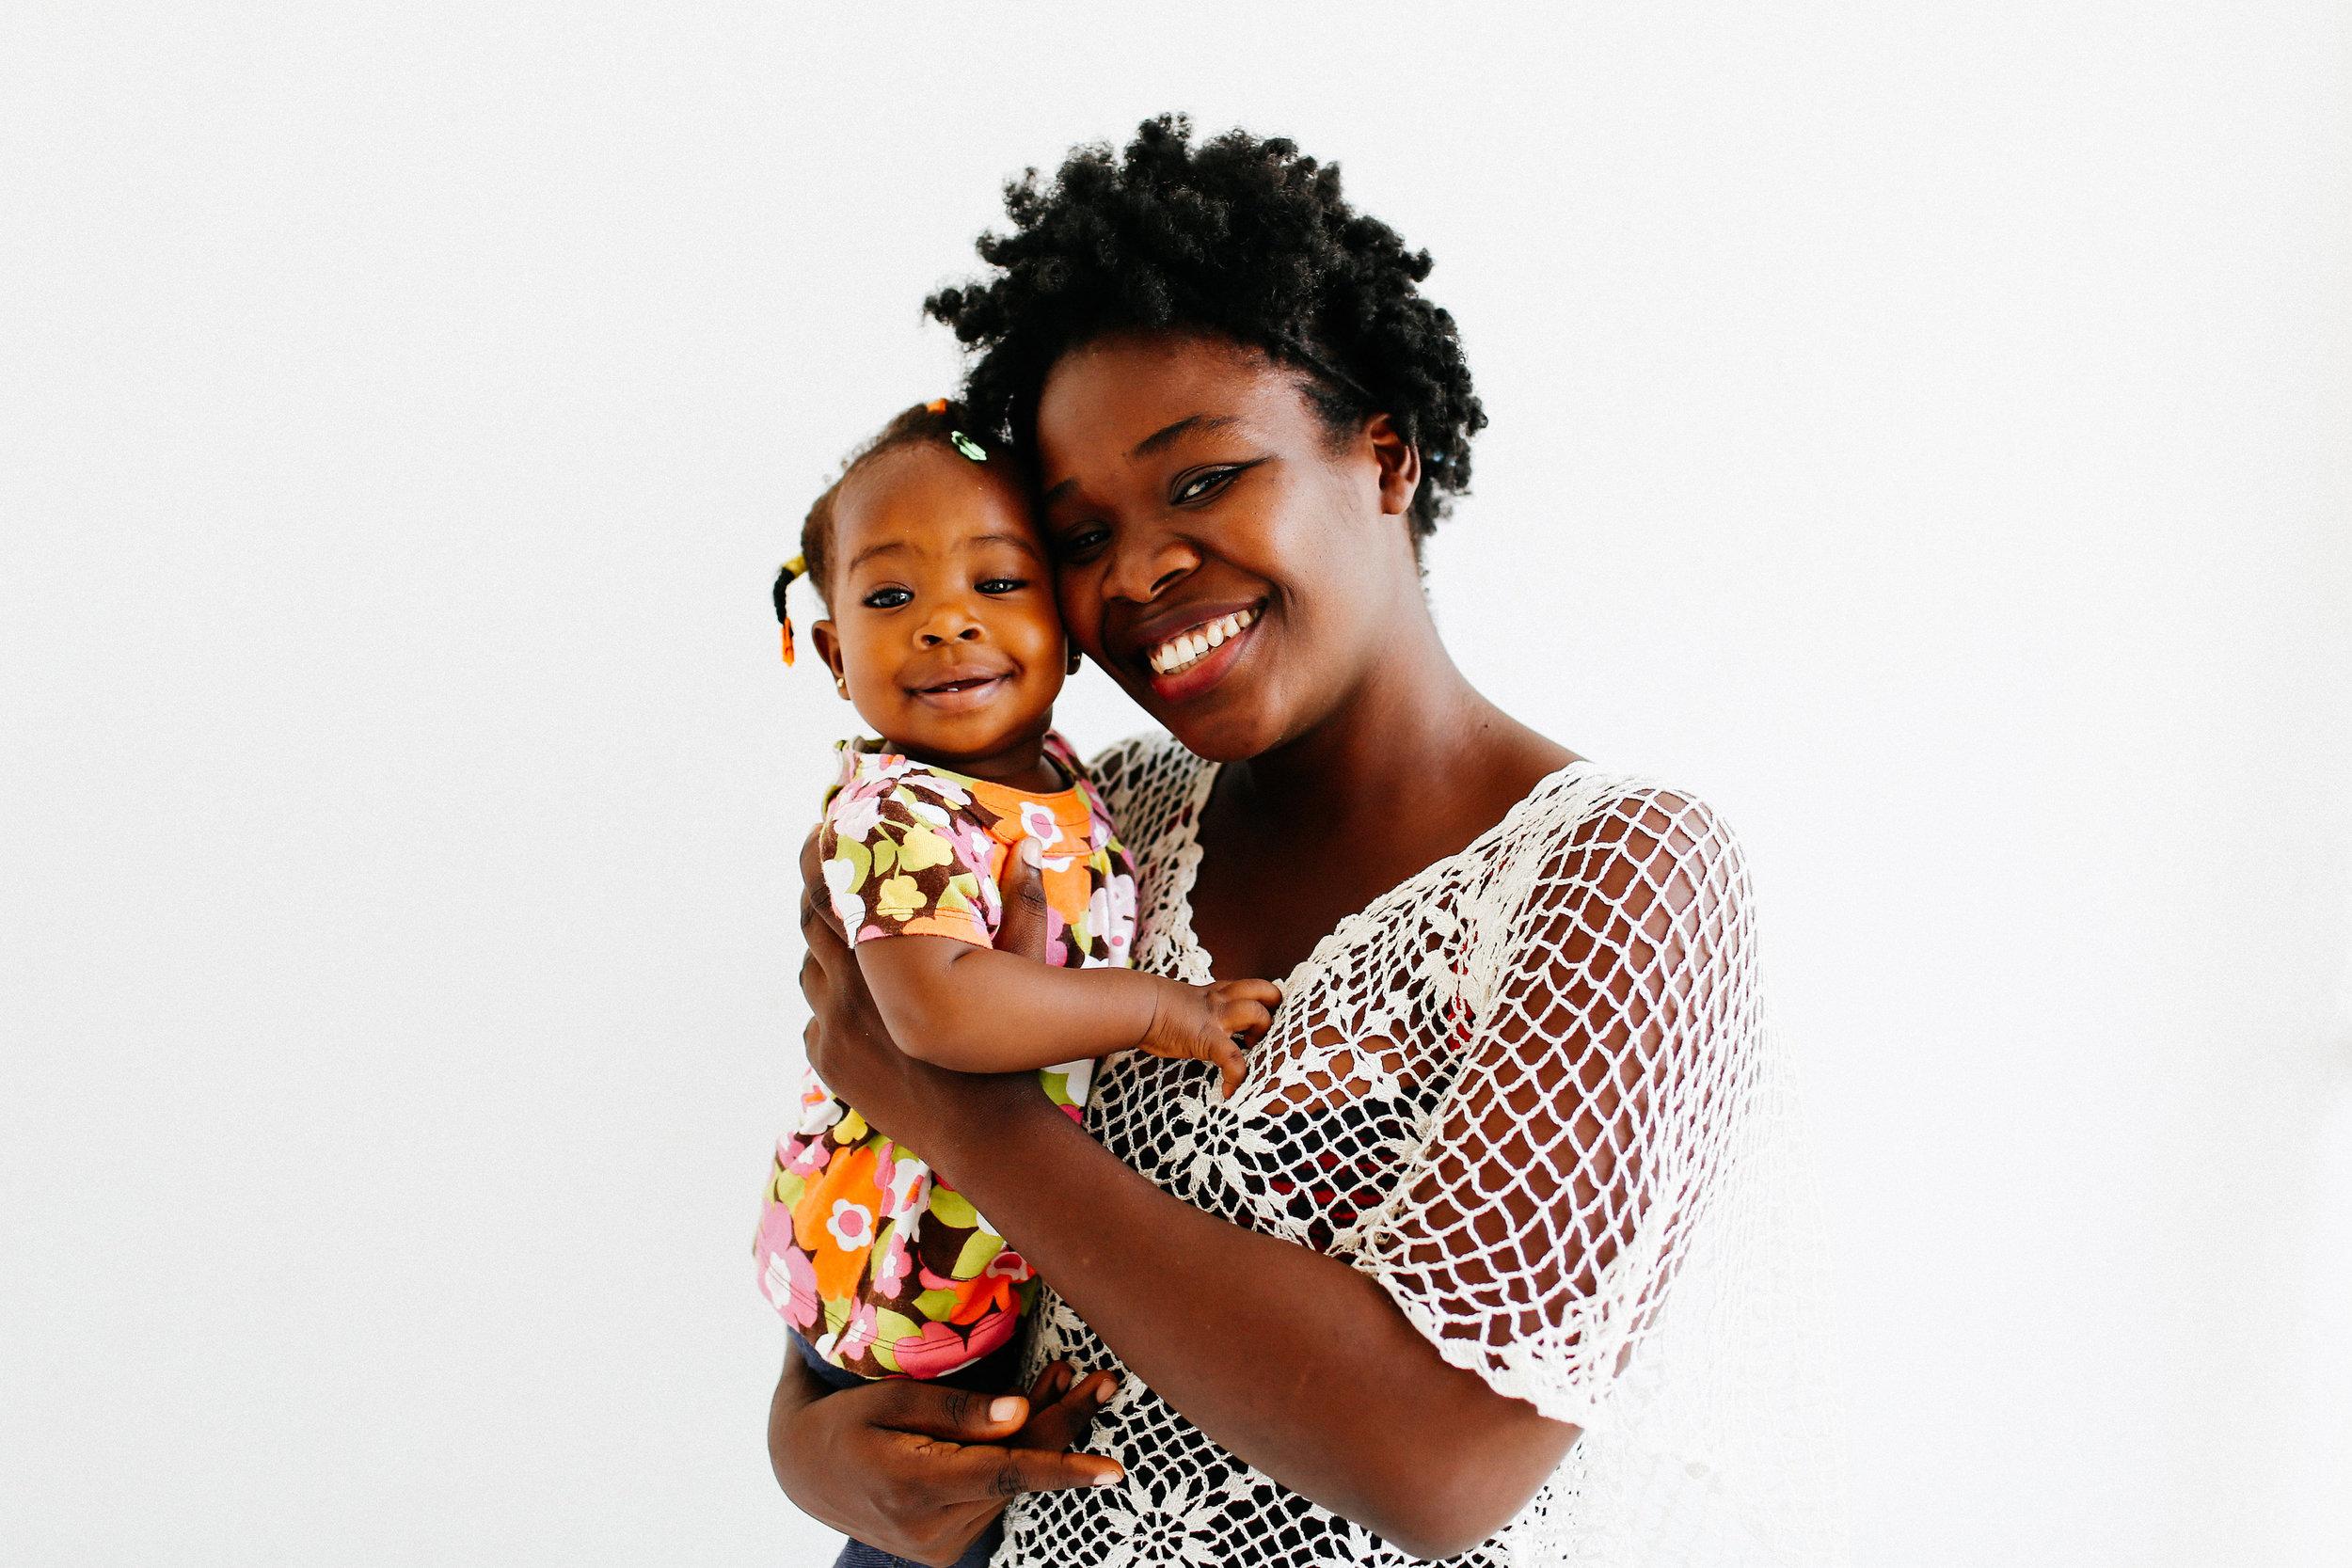 Darline, Jasper House Haiti Director of Education, and her daughter, Darayelle.